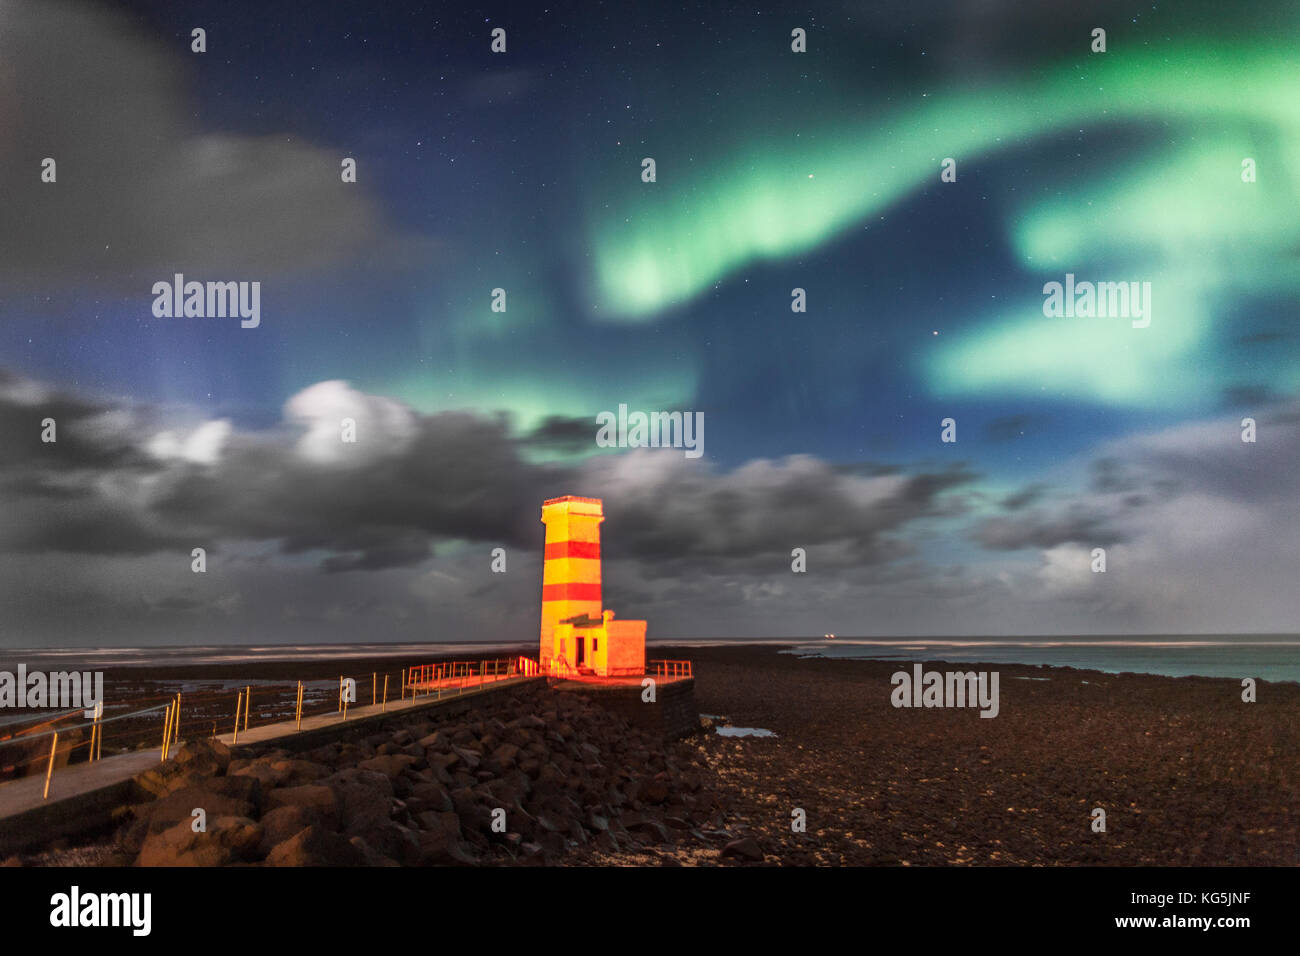 Nordlicht und gardskaga Leuchtturm, Halbinsel Reykjanes, Island Stockbild